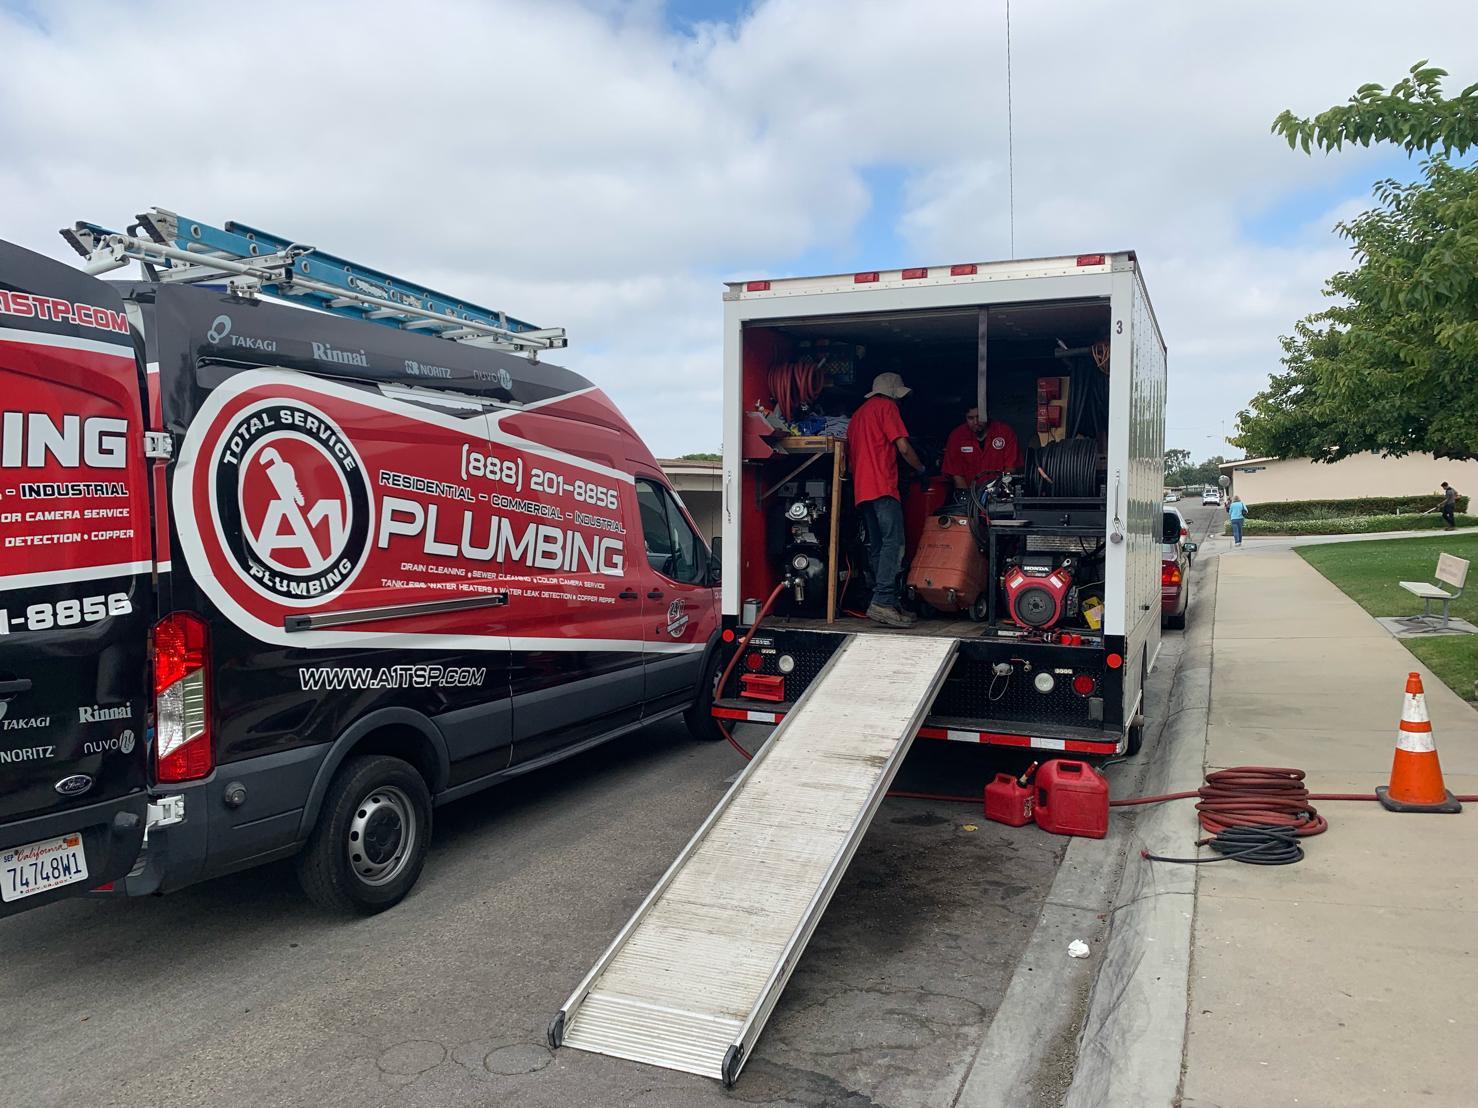 los-angeles-orange-county-service-plumbers